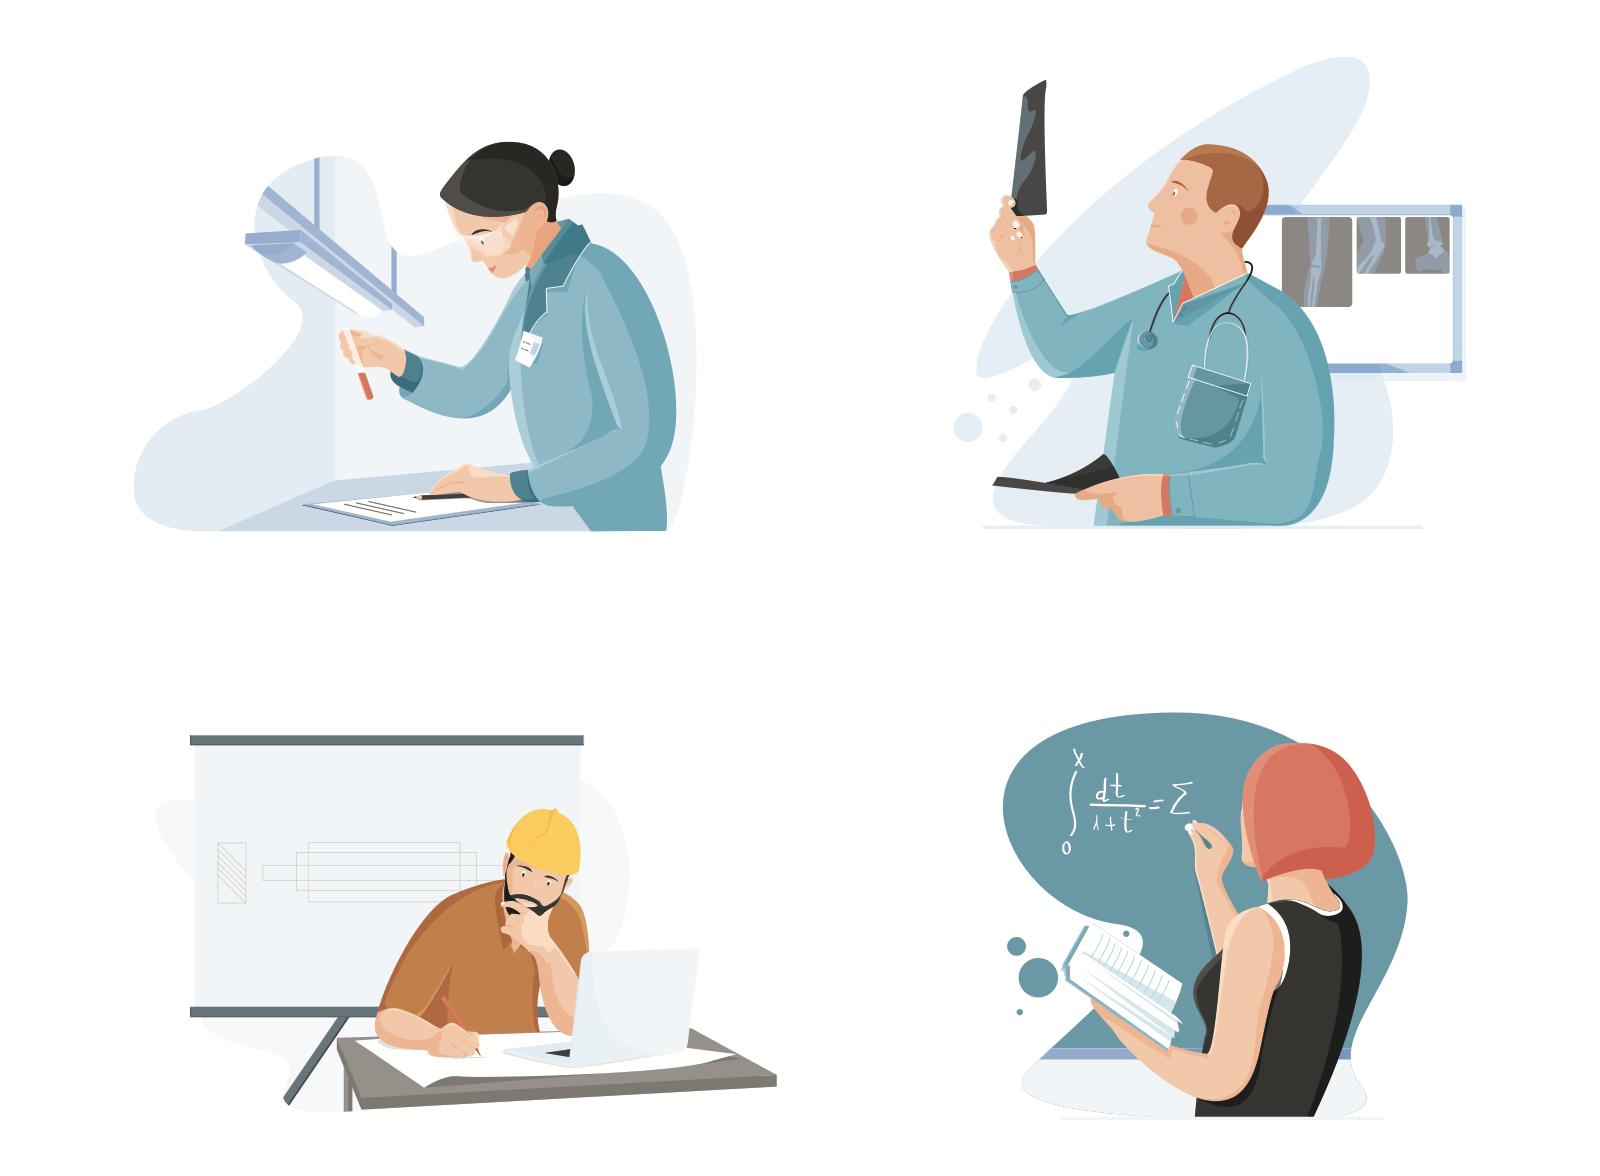 Professions illustrations